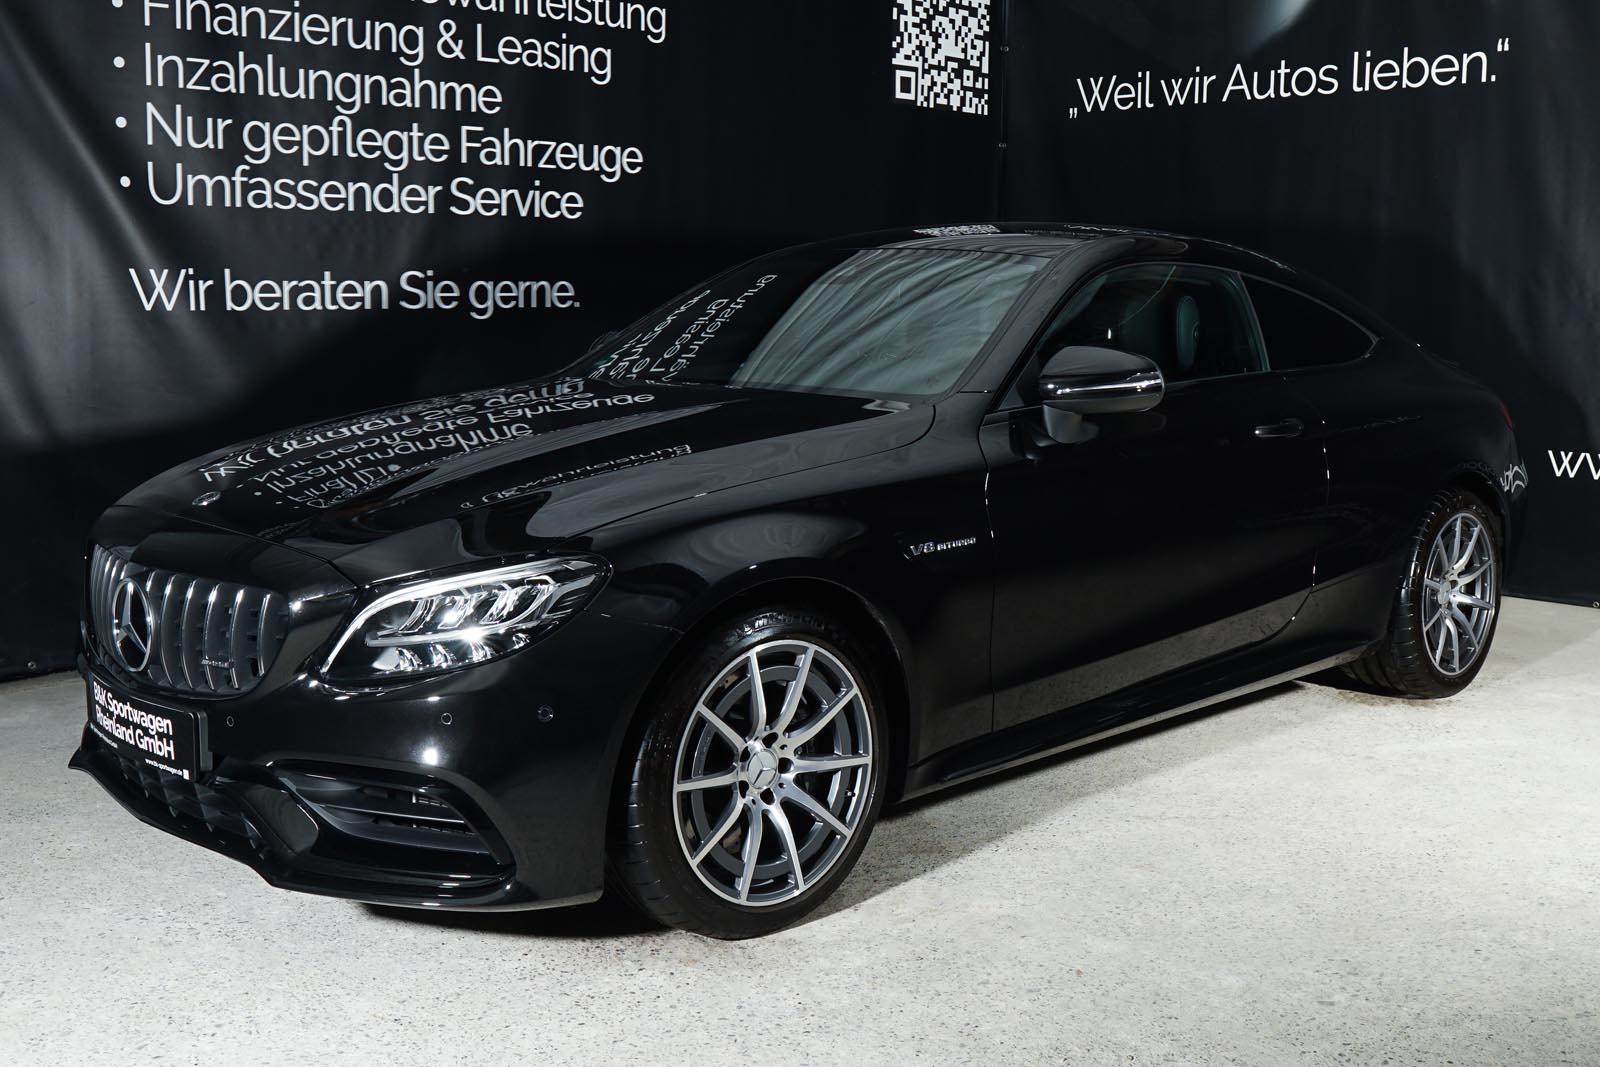 11mercedes-benz-c63-s-amg-coupe-schwarz_1